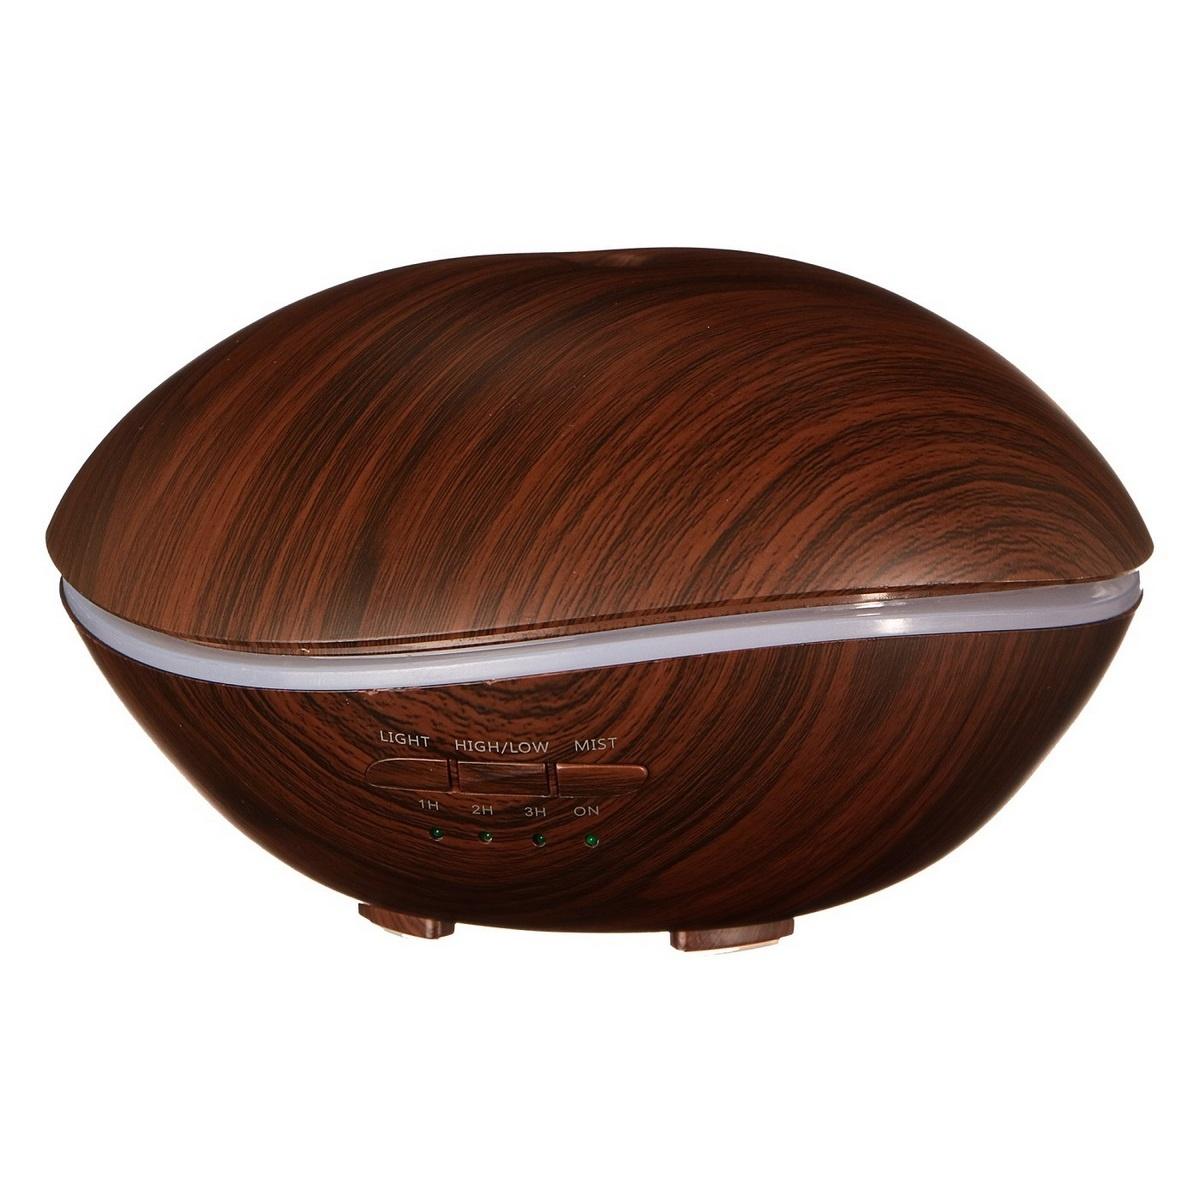 Sixtol Aróma difuzér Stone tmavé drevo, 500 ml